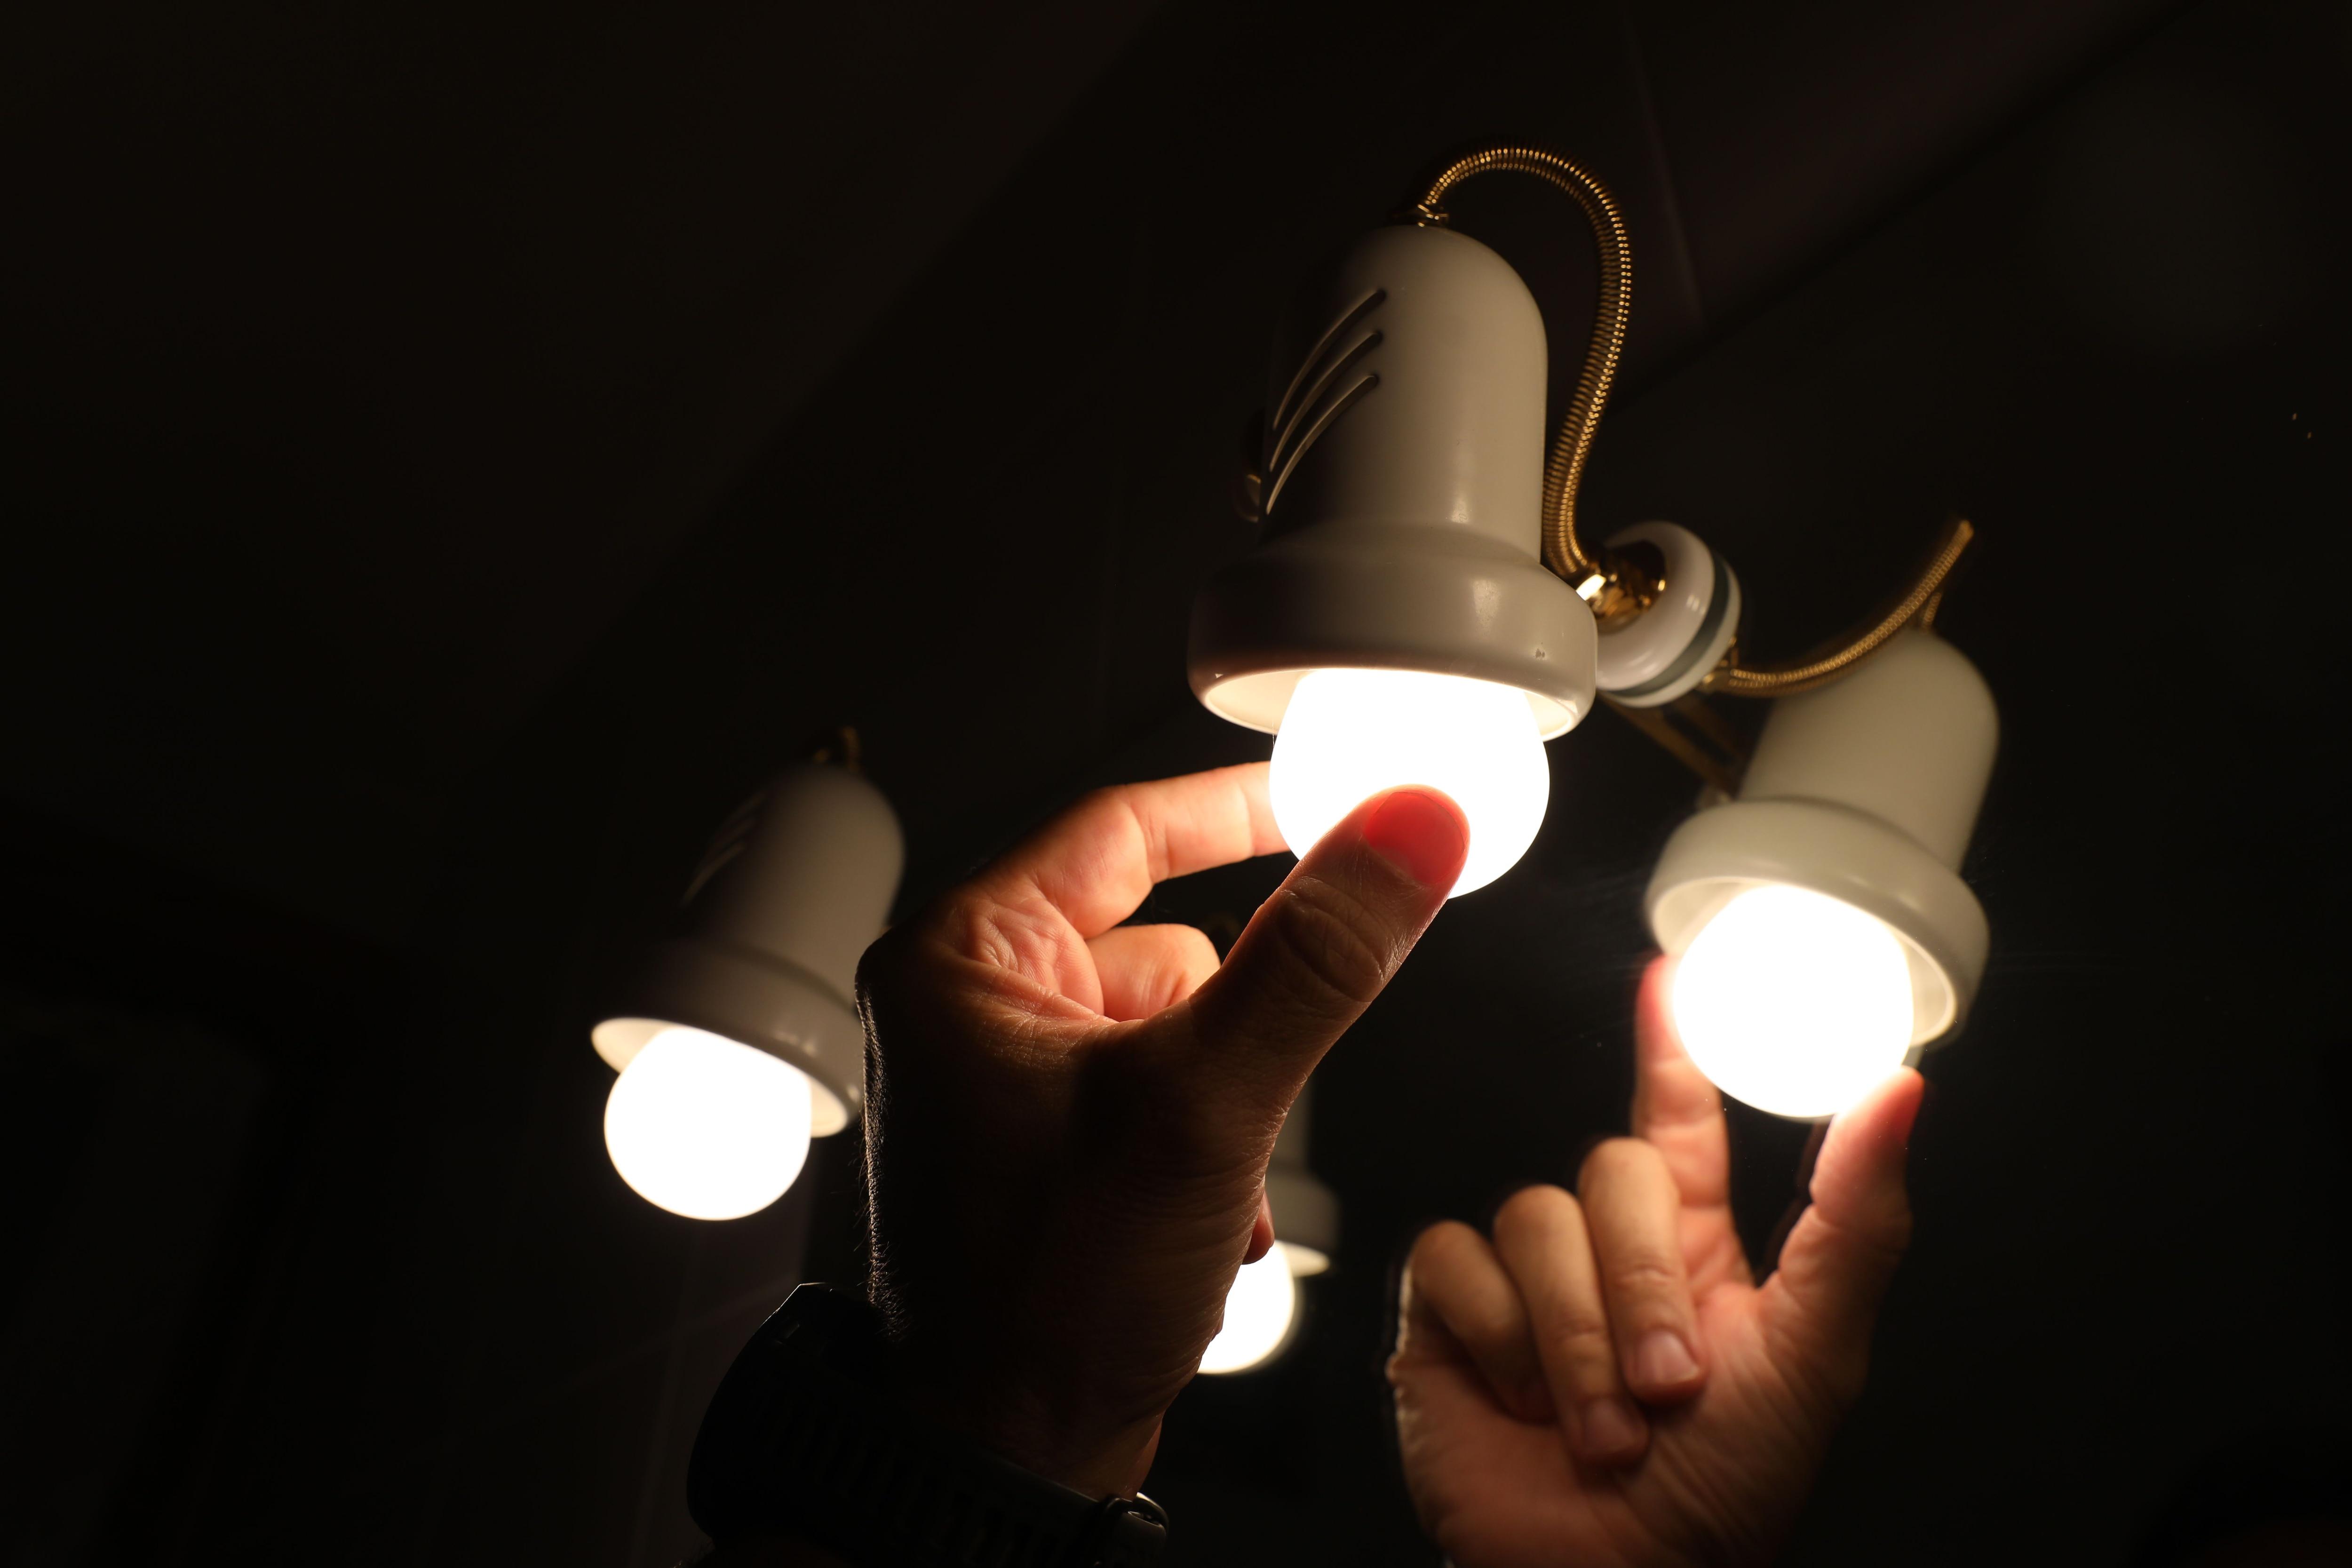 Prográmese con Infobae para saber si su barrio o localidad será afectada por cortes de luz. Foto: Marta Fernández - Europa Press